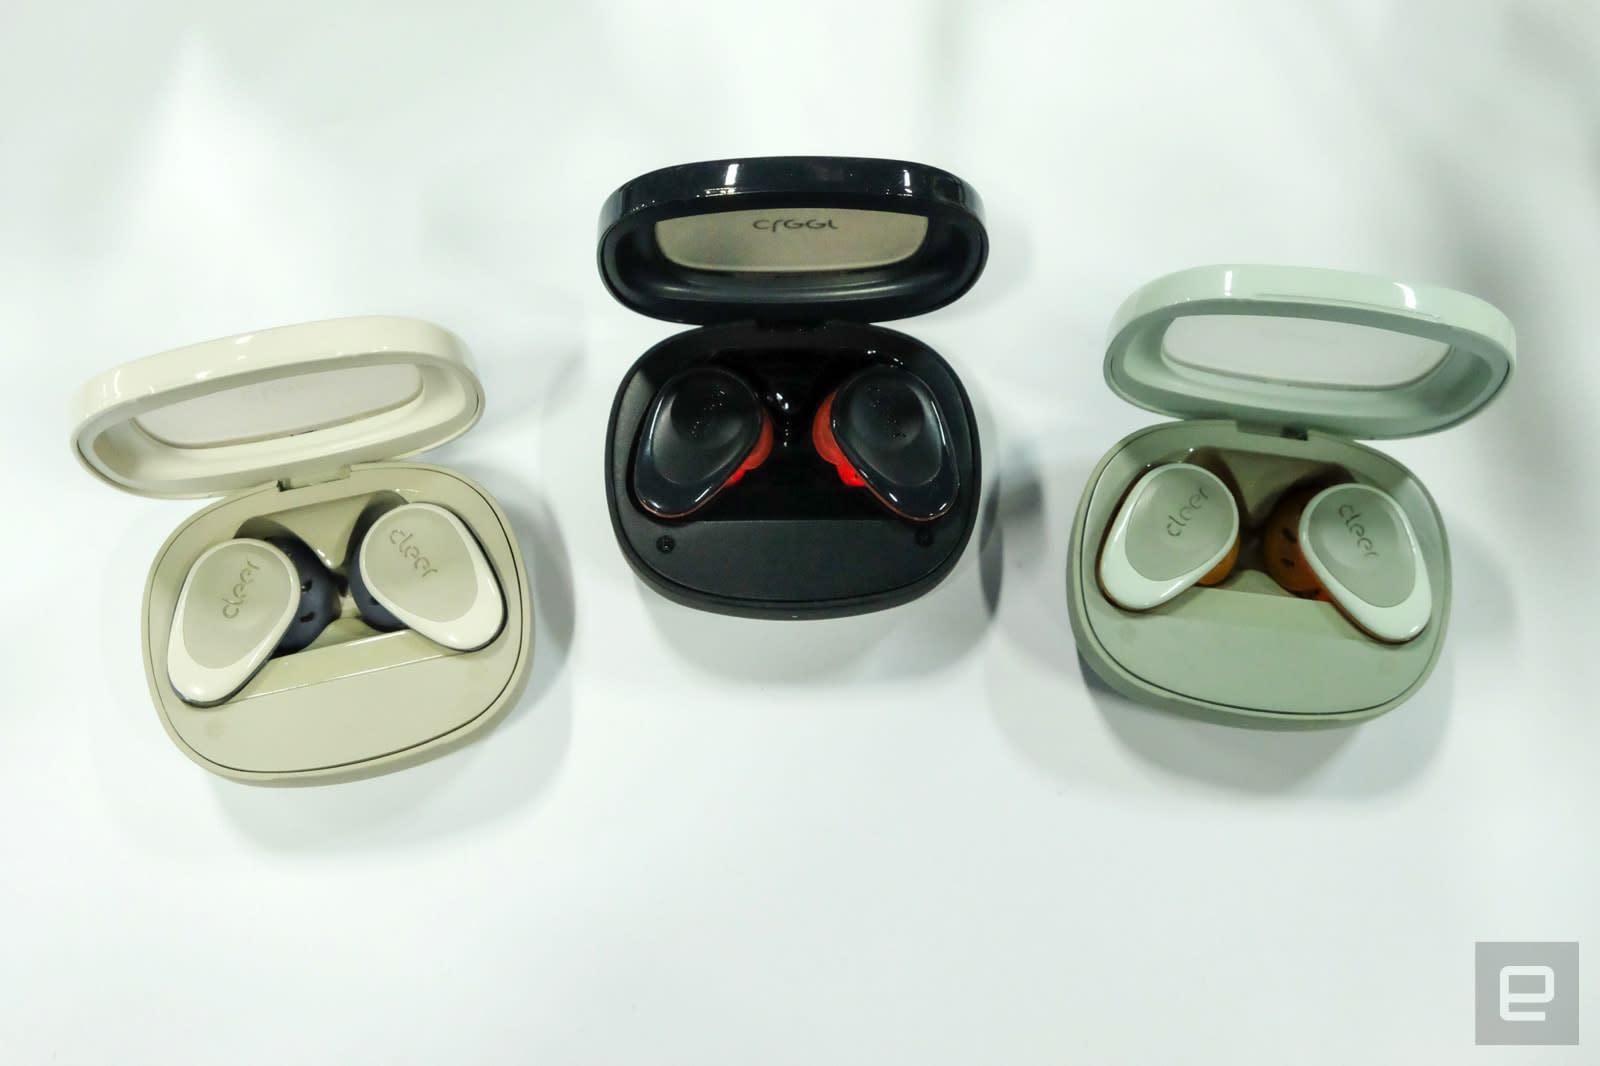 Cleer Goal true wireless earbuds